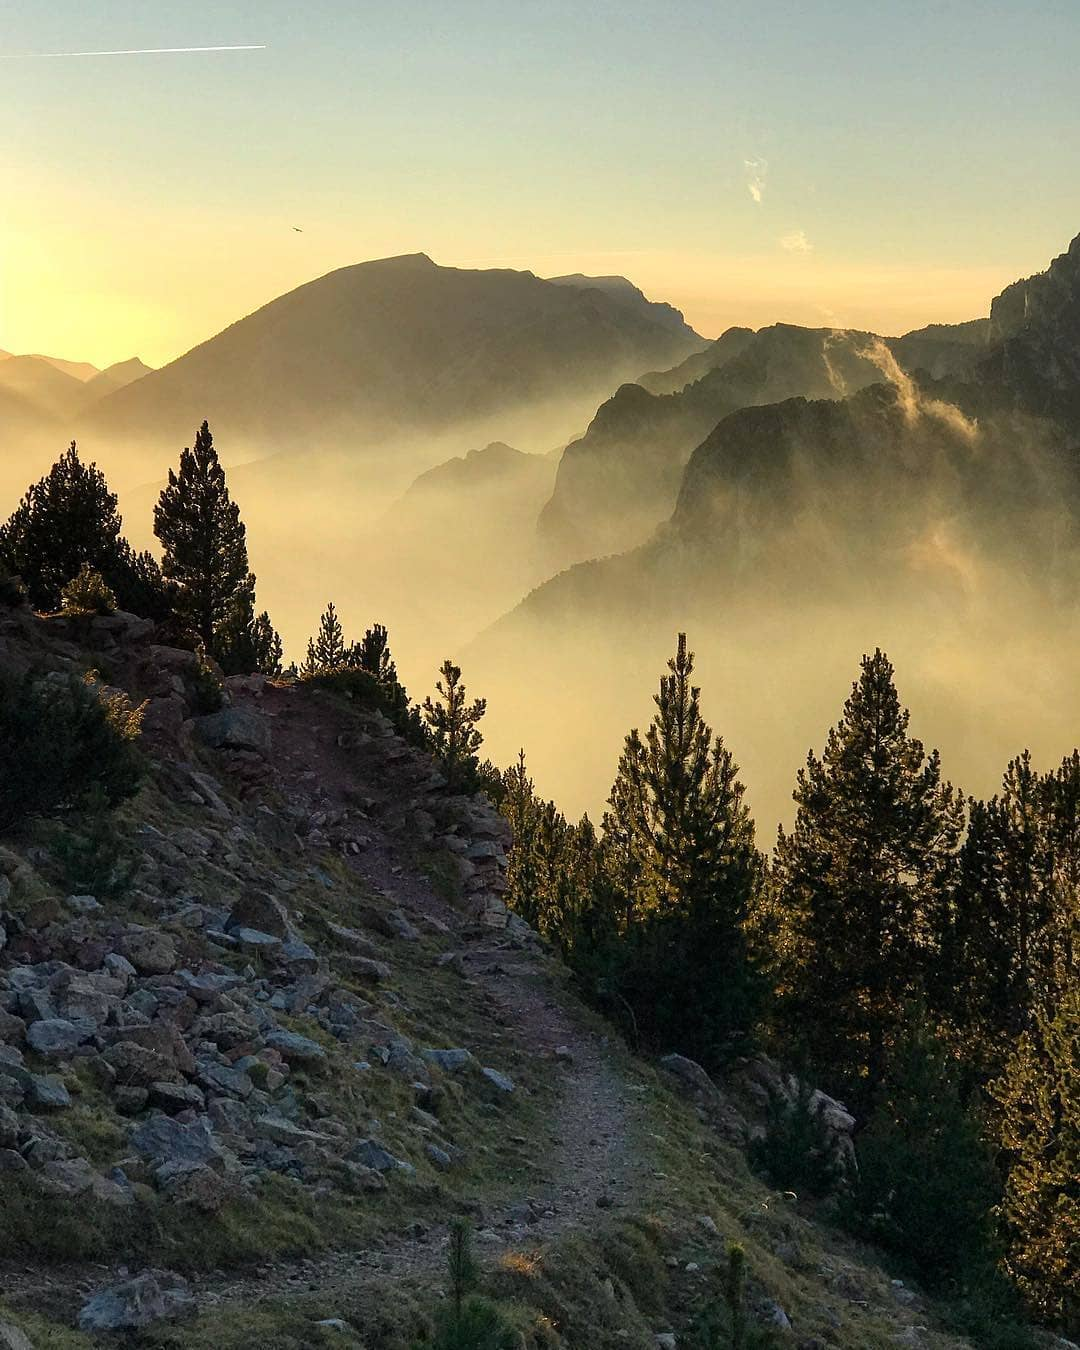 Fotografía montaña Pirineos by @fionamcleanphoto